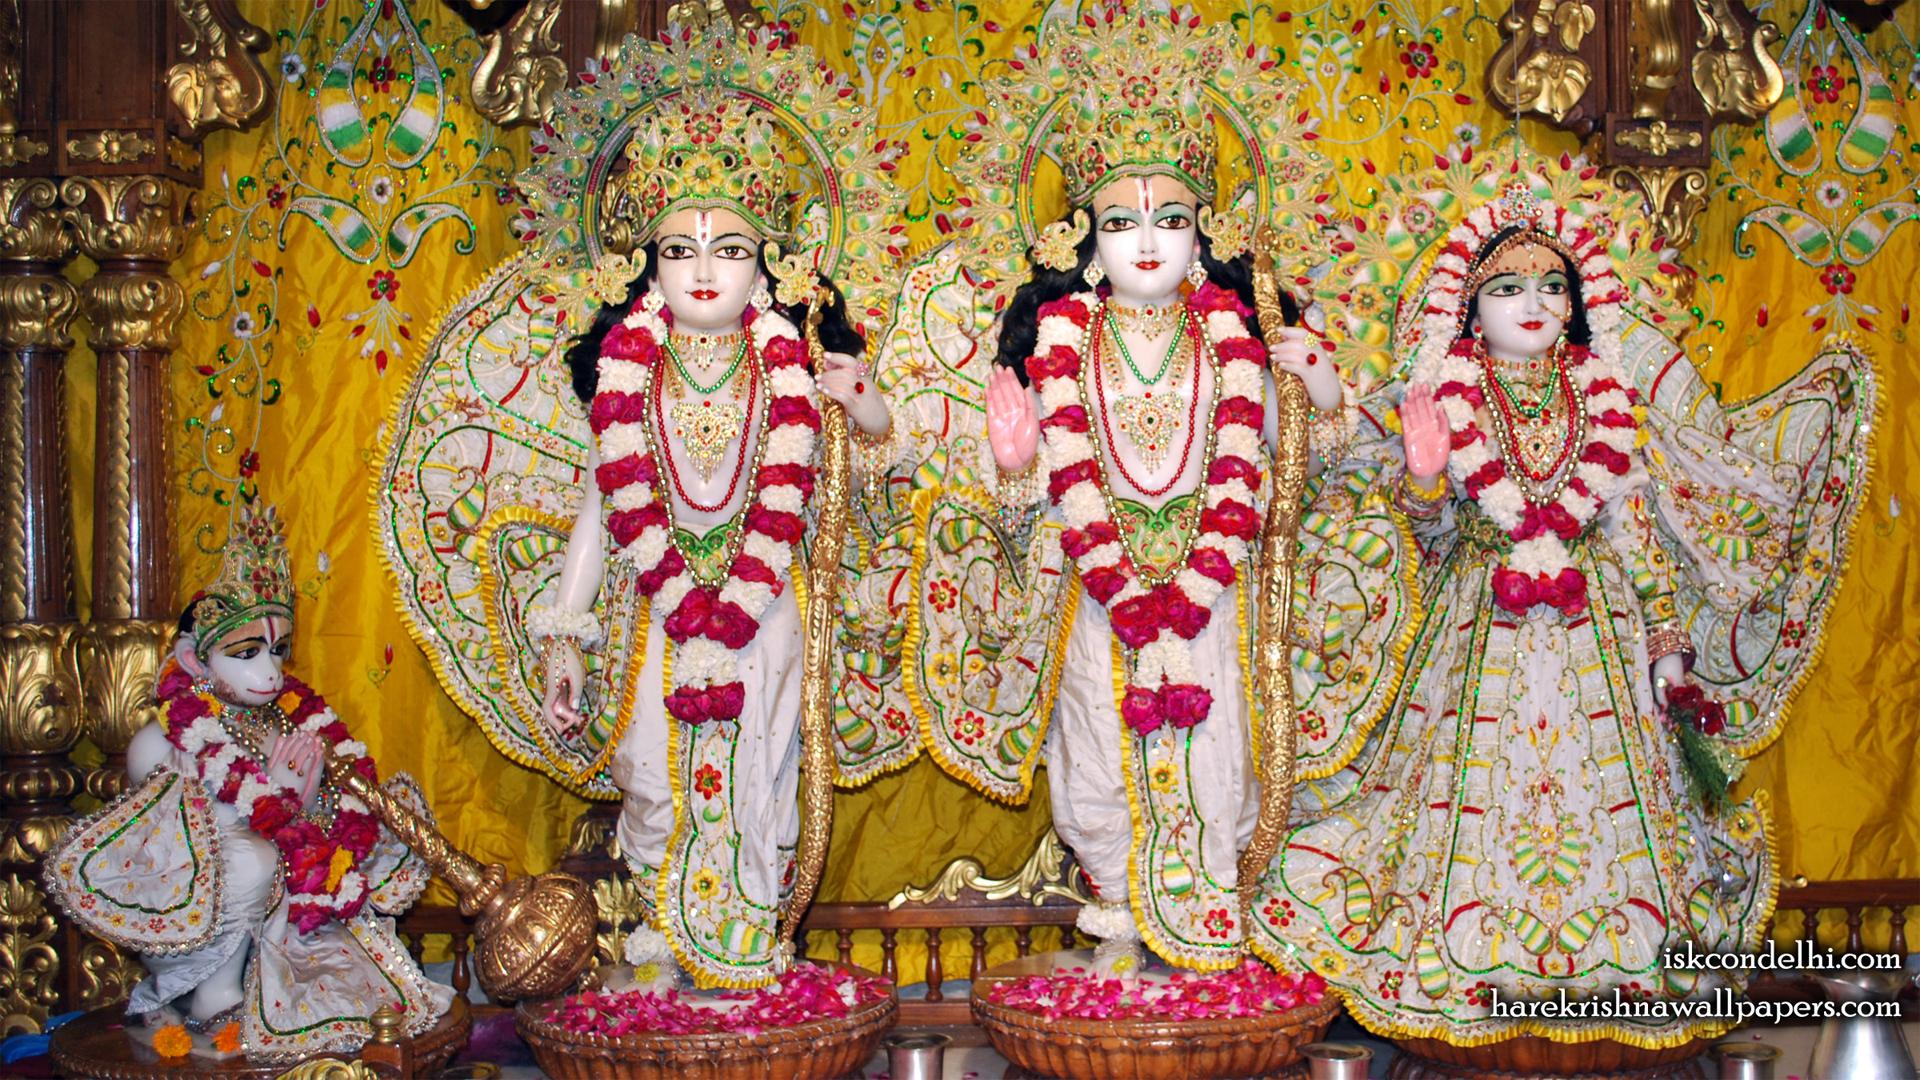 Sri Sri Sita Rama Laxman Hanuman Wallpaper (005) Size 1920x1080 Download